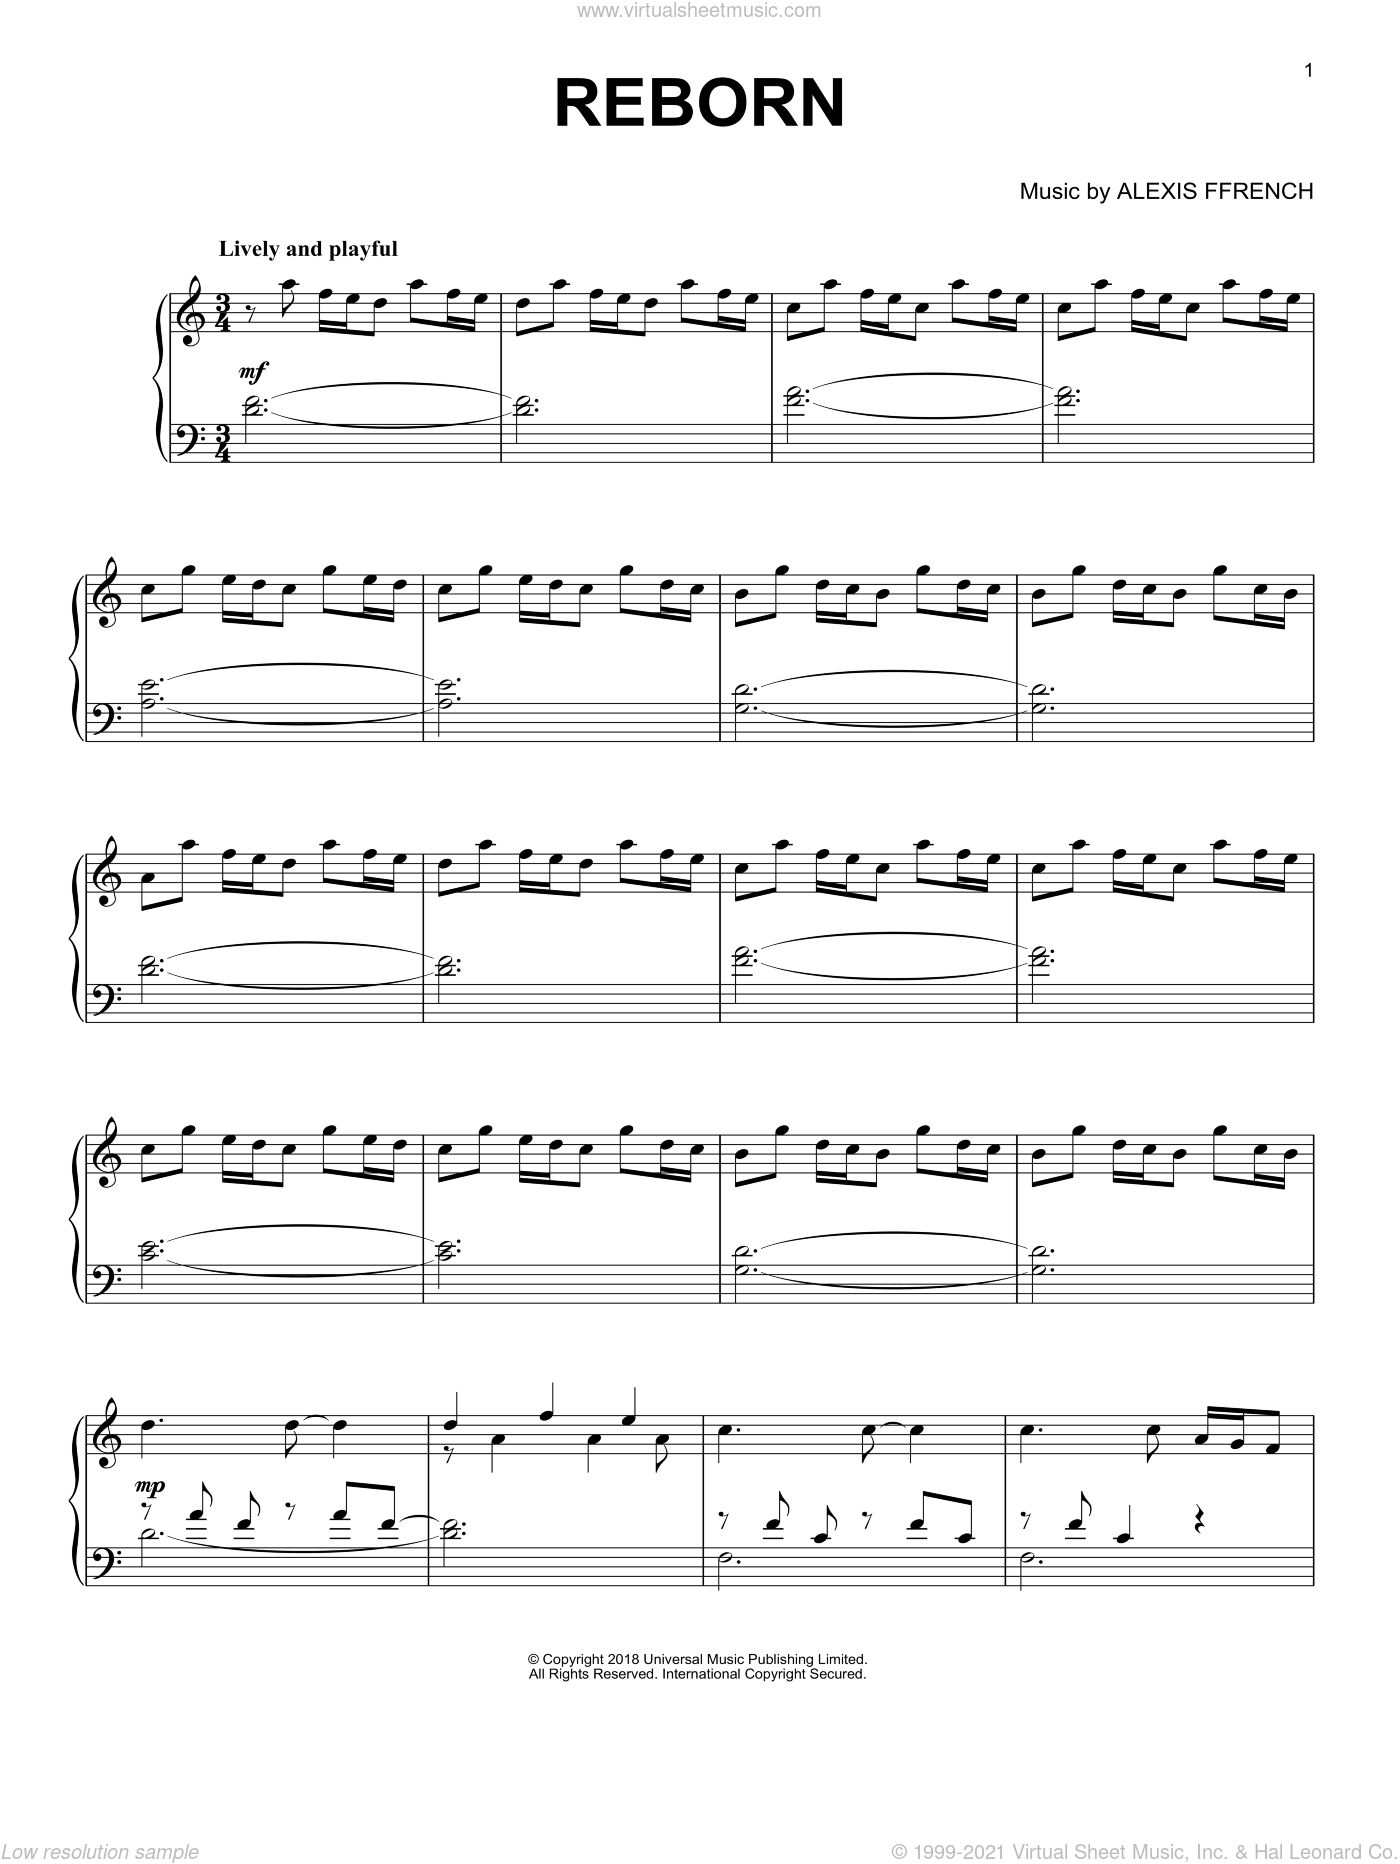 Reborn sheet music for piano solo by Alexis Ffrench, classical score, intermediate skill level